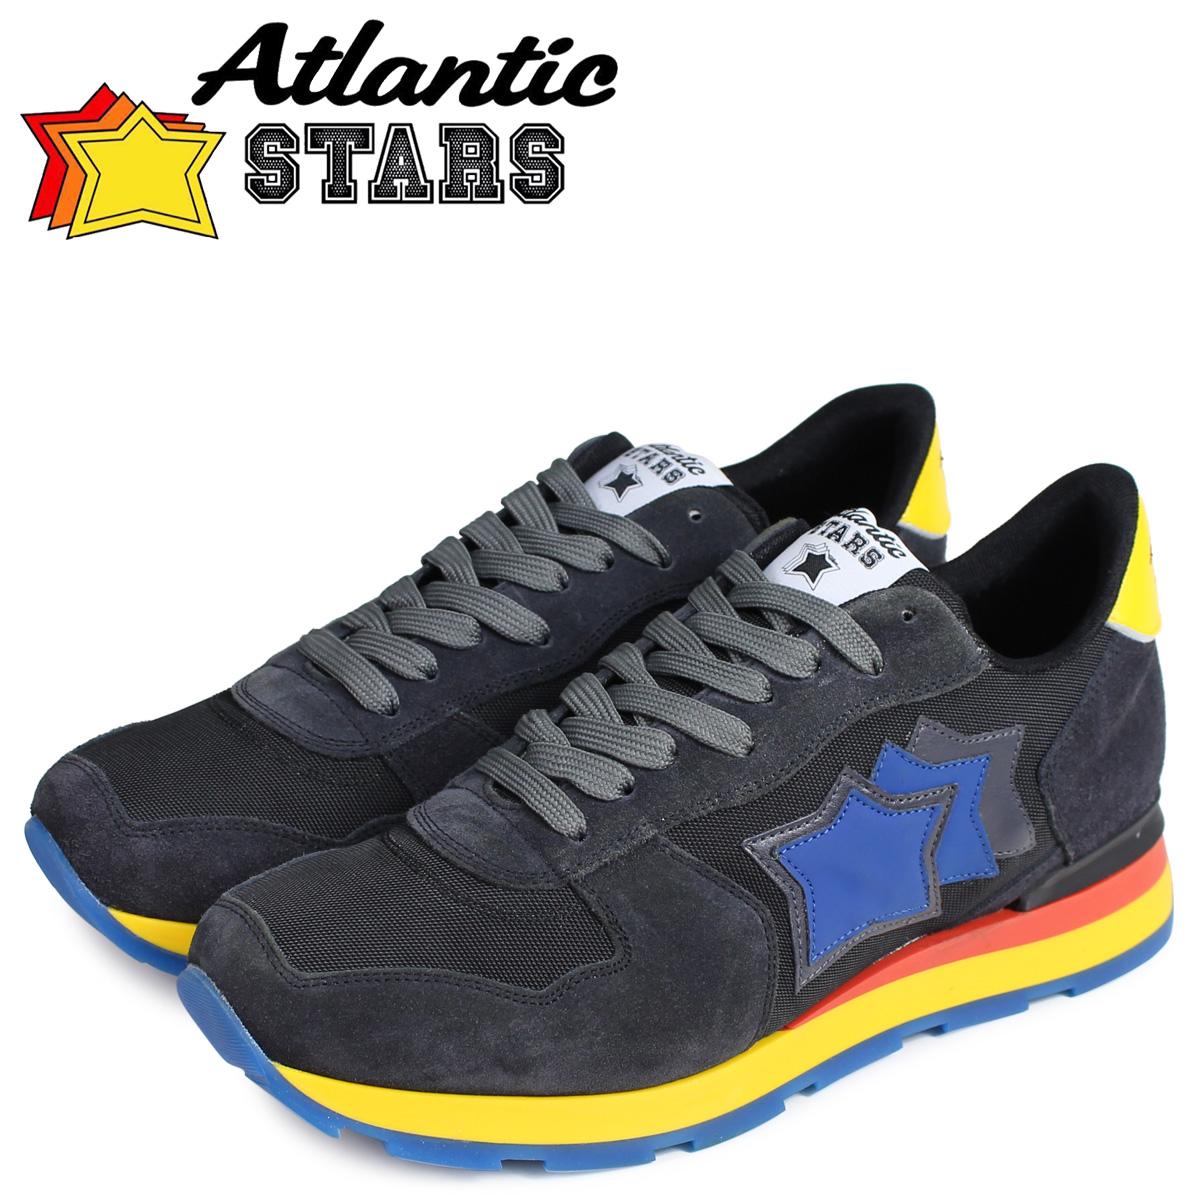 Atlantic STARS アトランティックスターズ アンタレス スニーカー メンズ ANTARES ネイビー ANG-49N